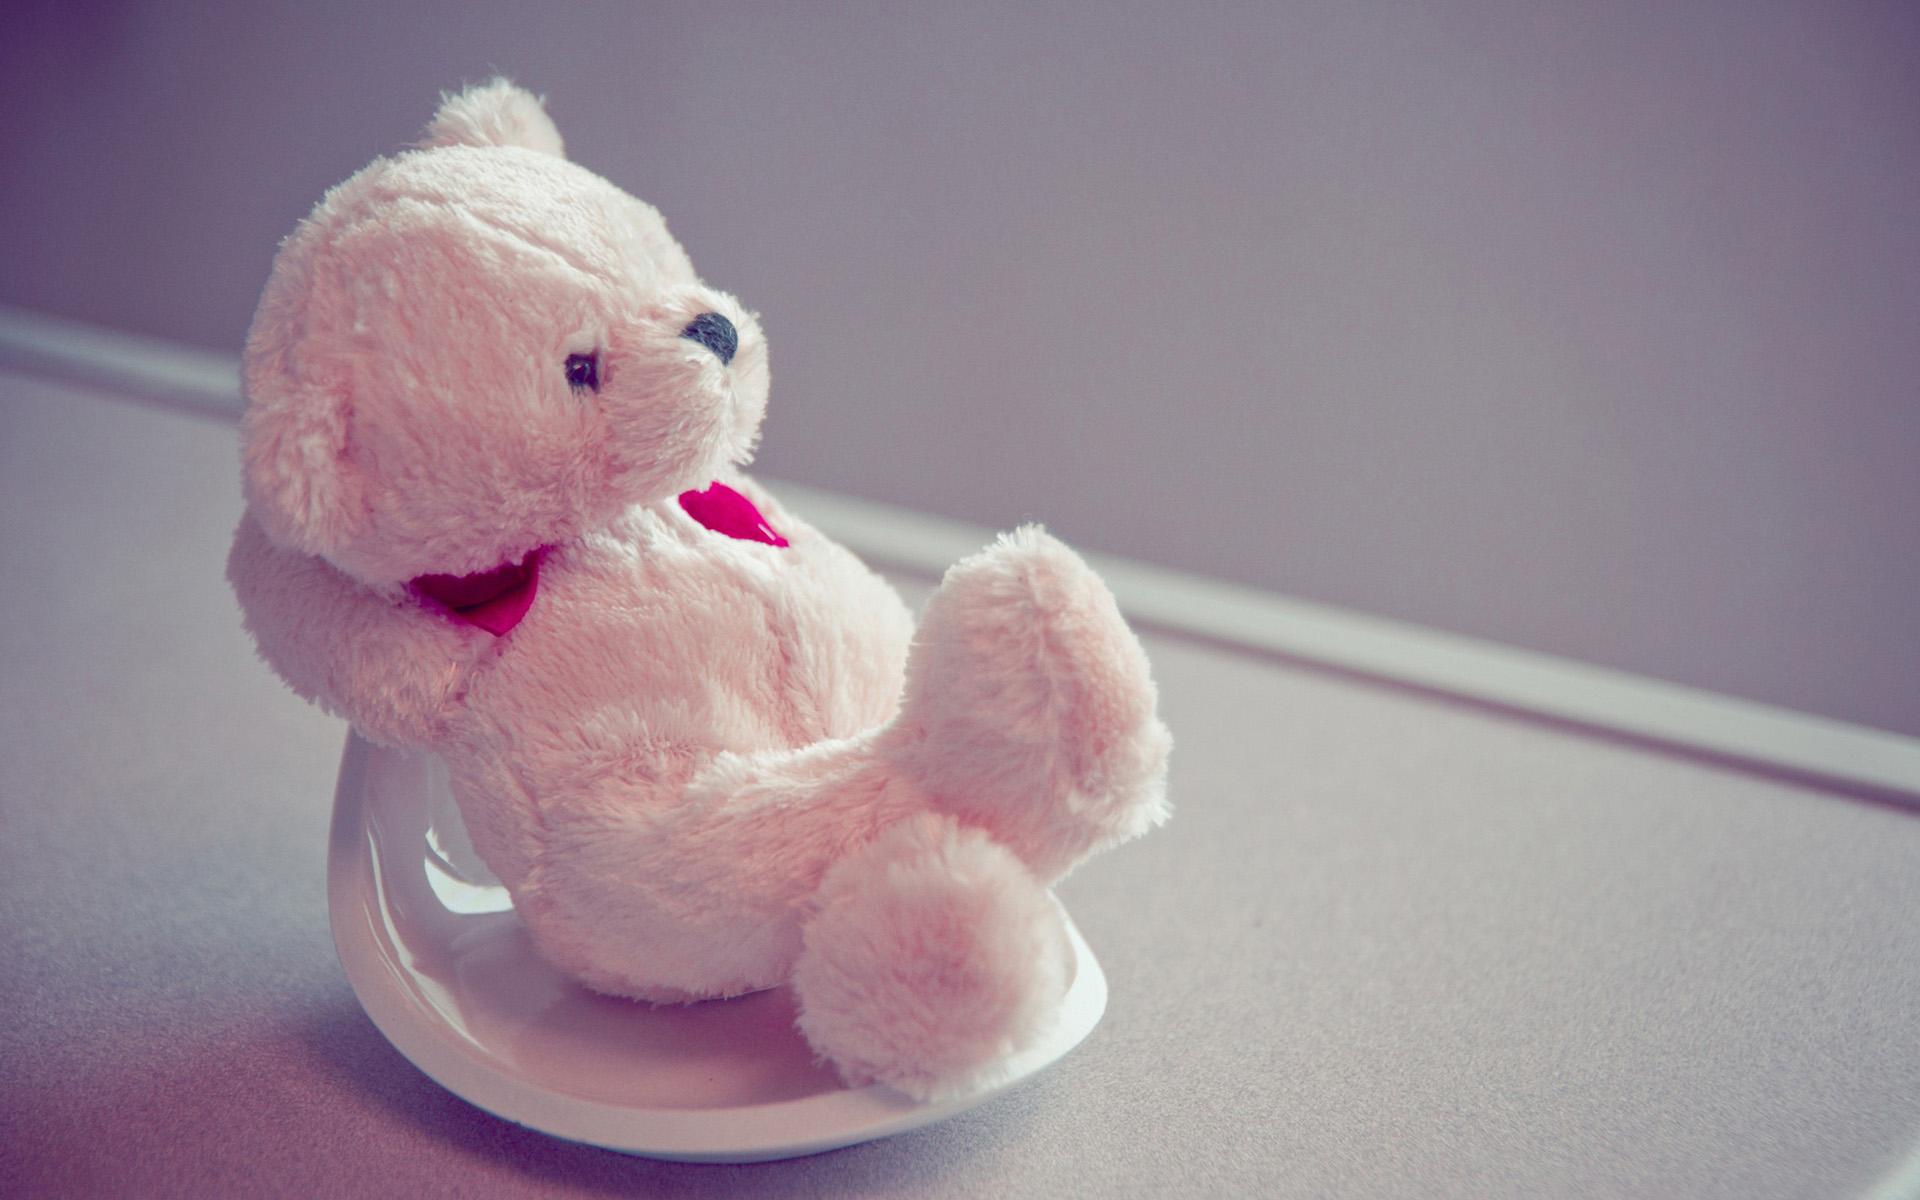 Sweet Pose Teddy Bear - Sweet Pose Teddy Bear